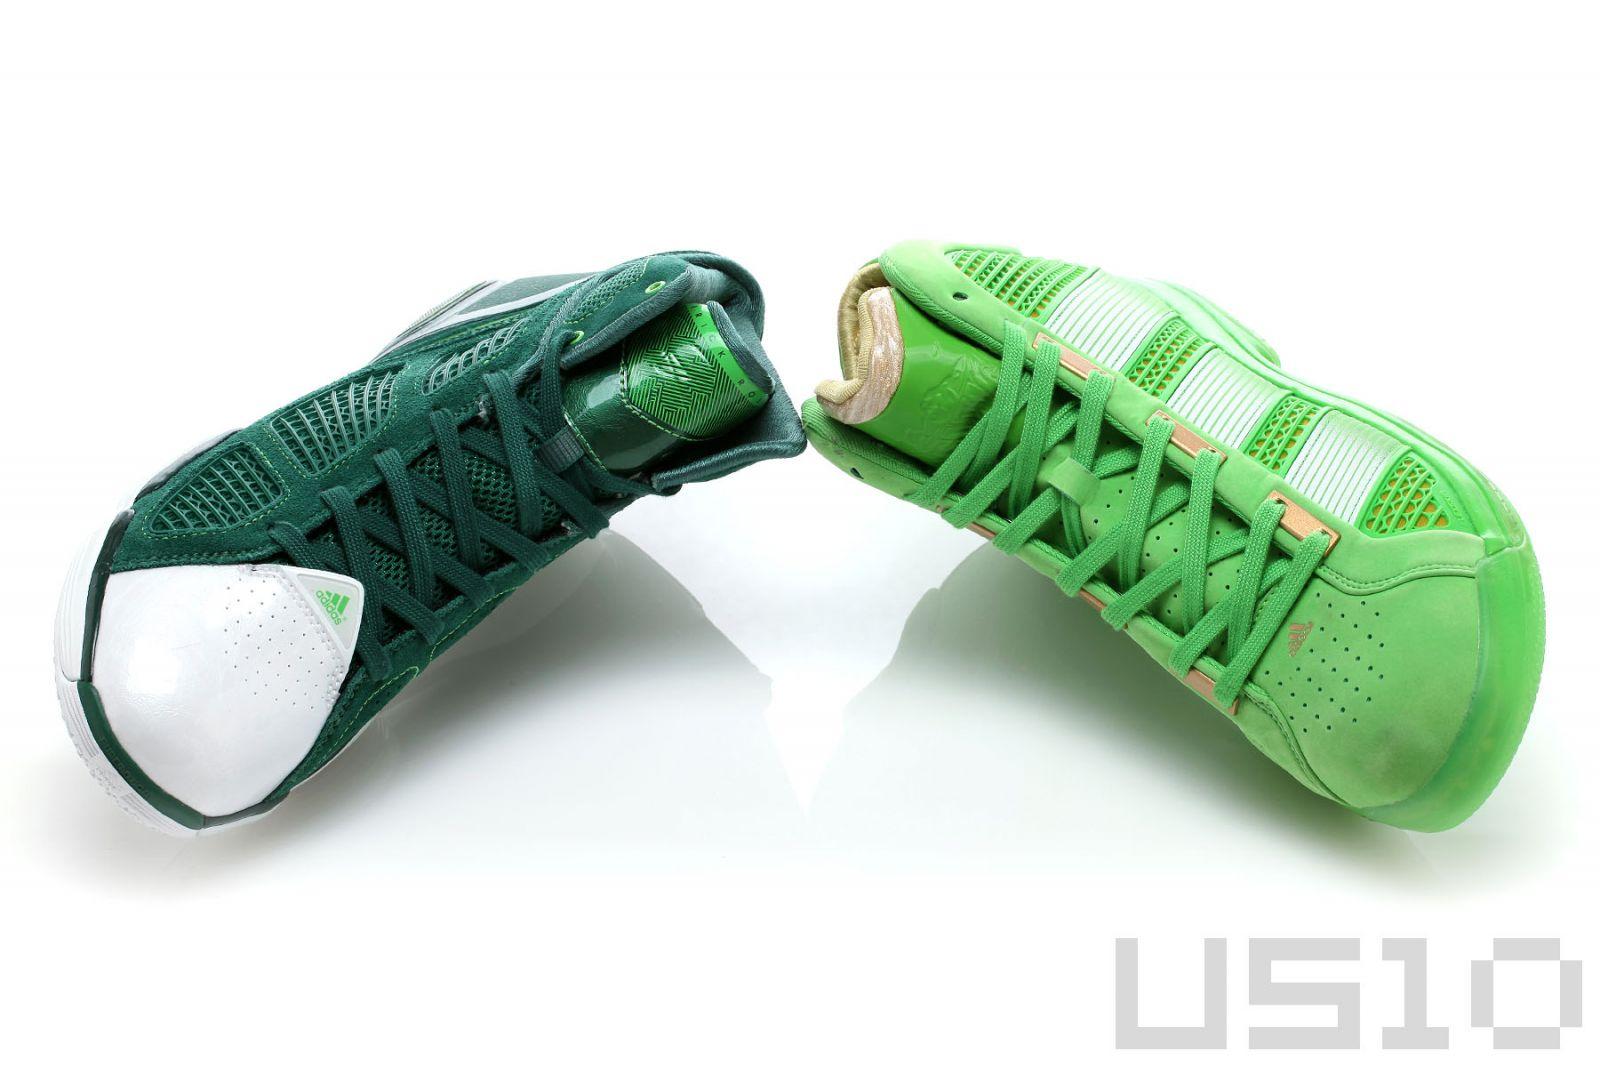 525f249236aef4 adidas Basketball - adiZero Rose 1.5   Super Beast St. Patrick s Day 2011